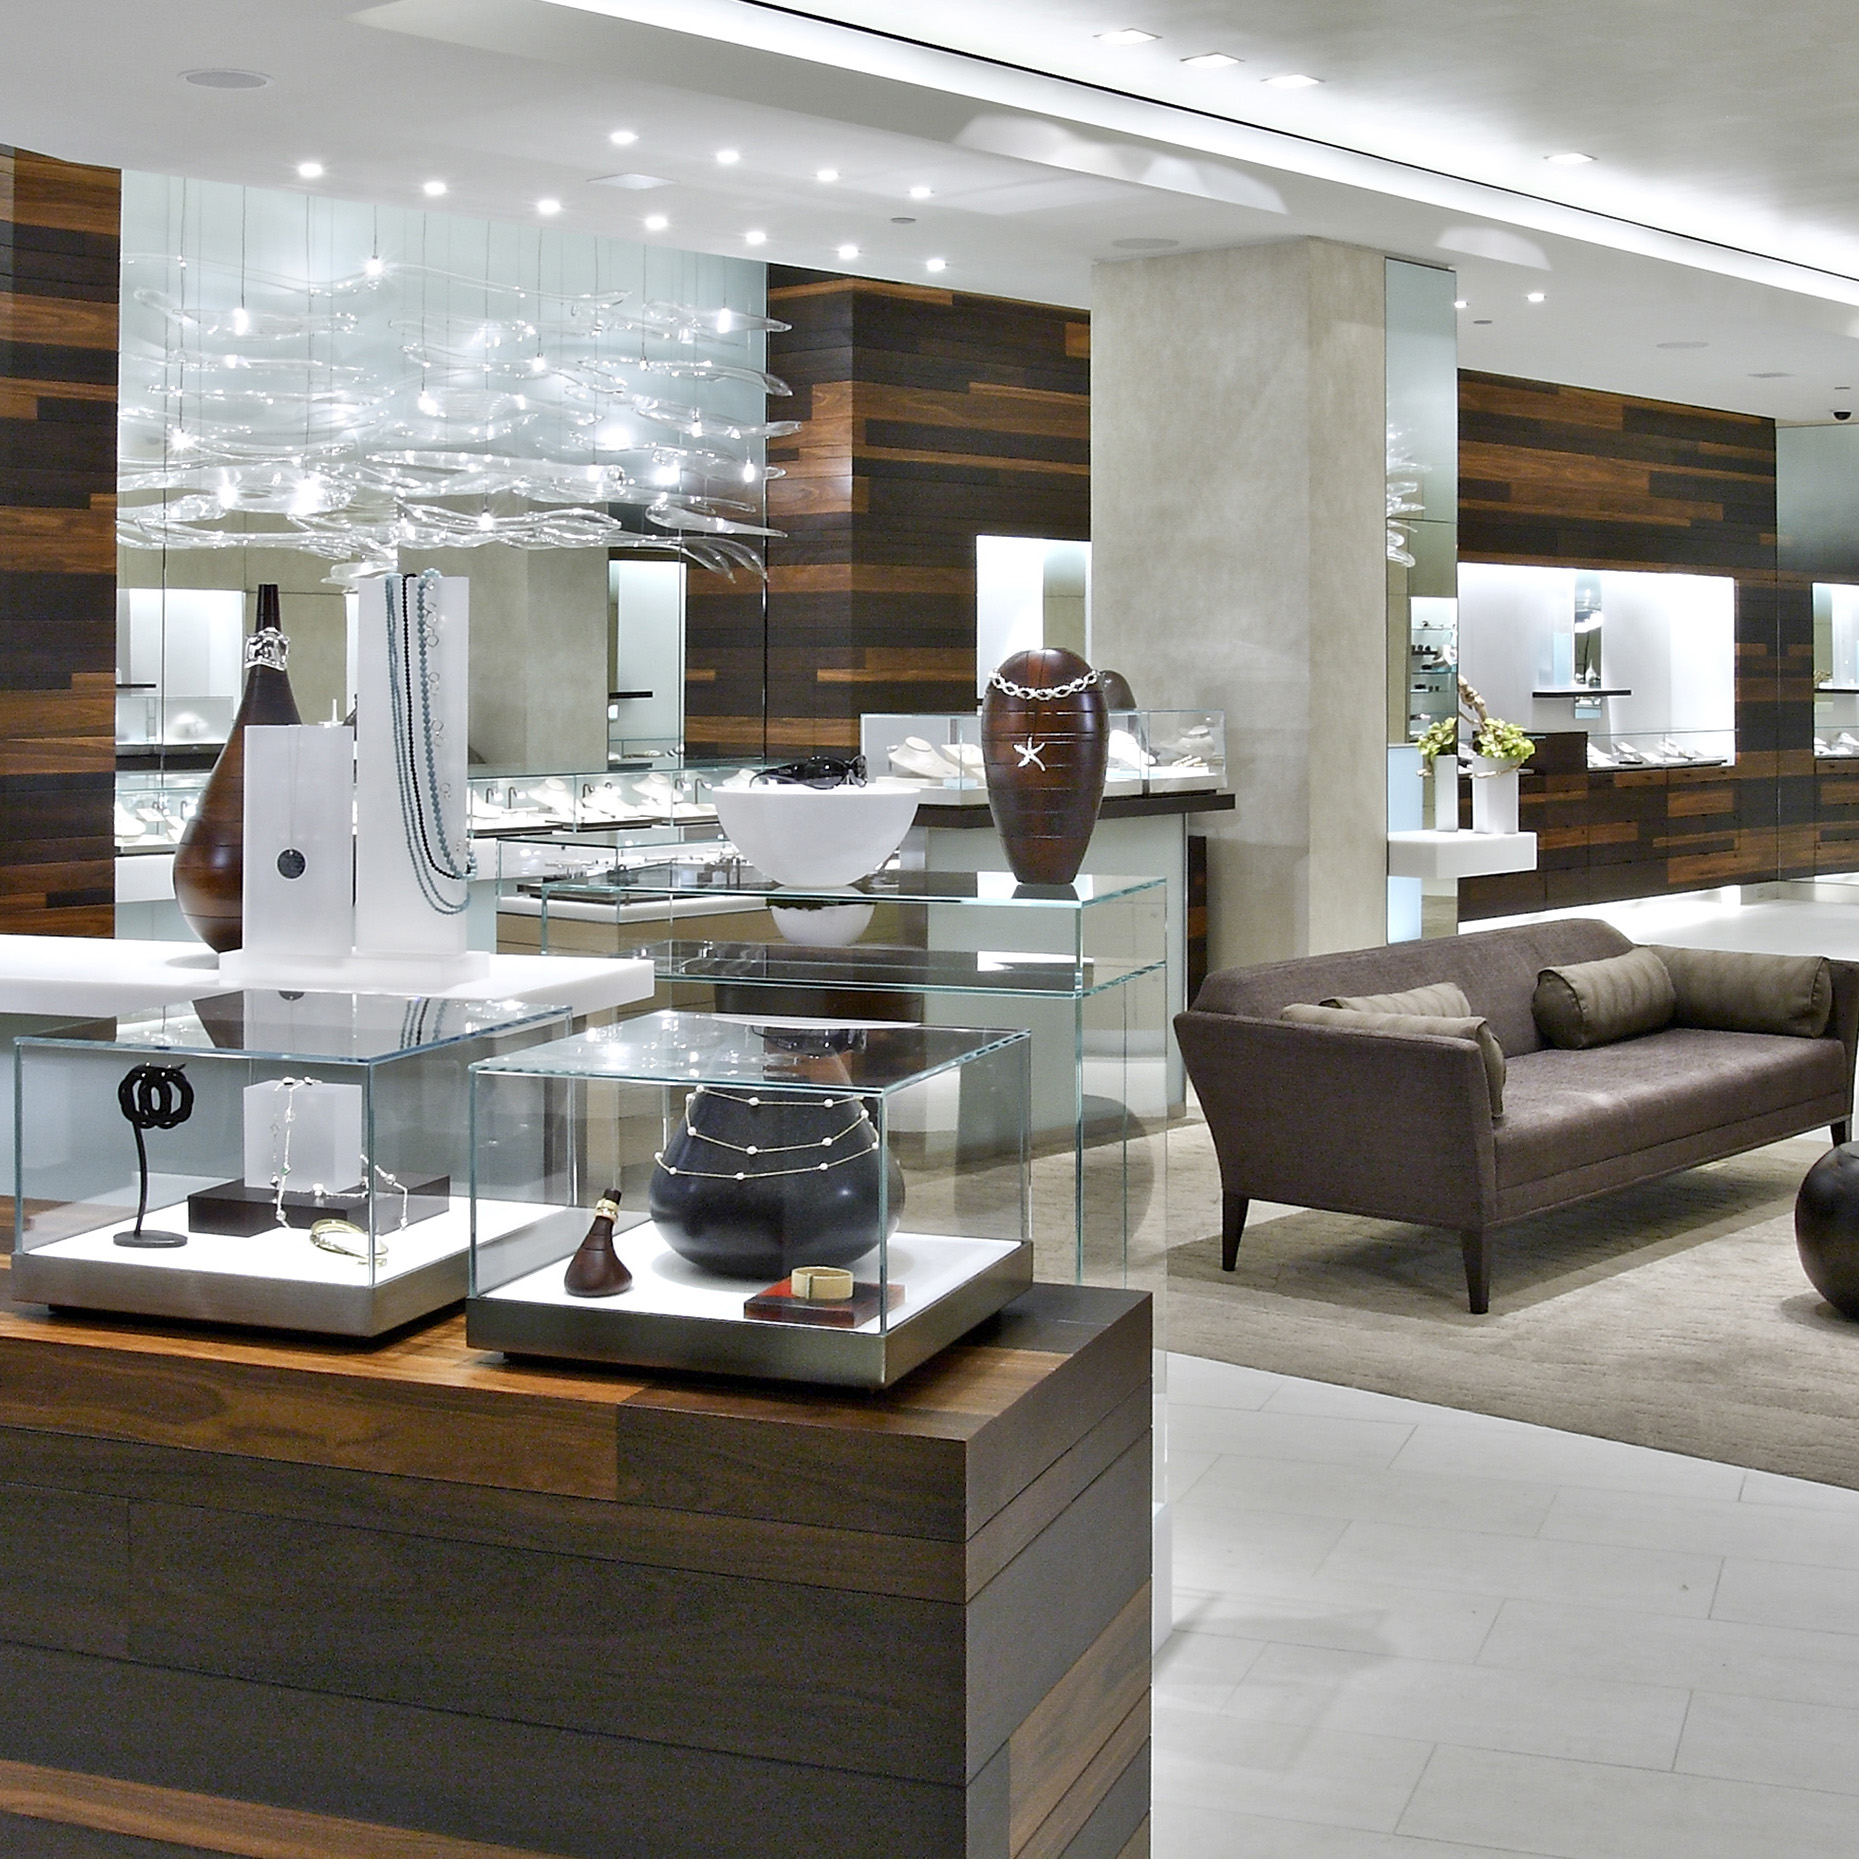 Tiffany & Co., Glendale CA